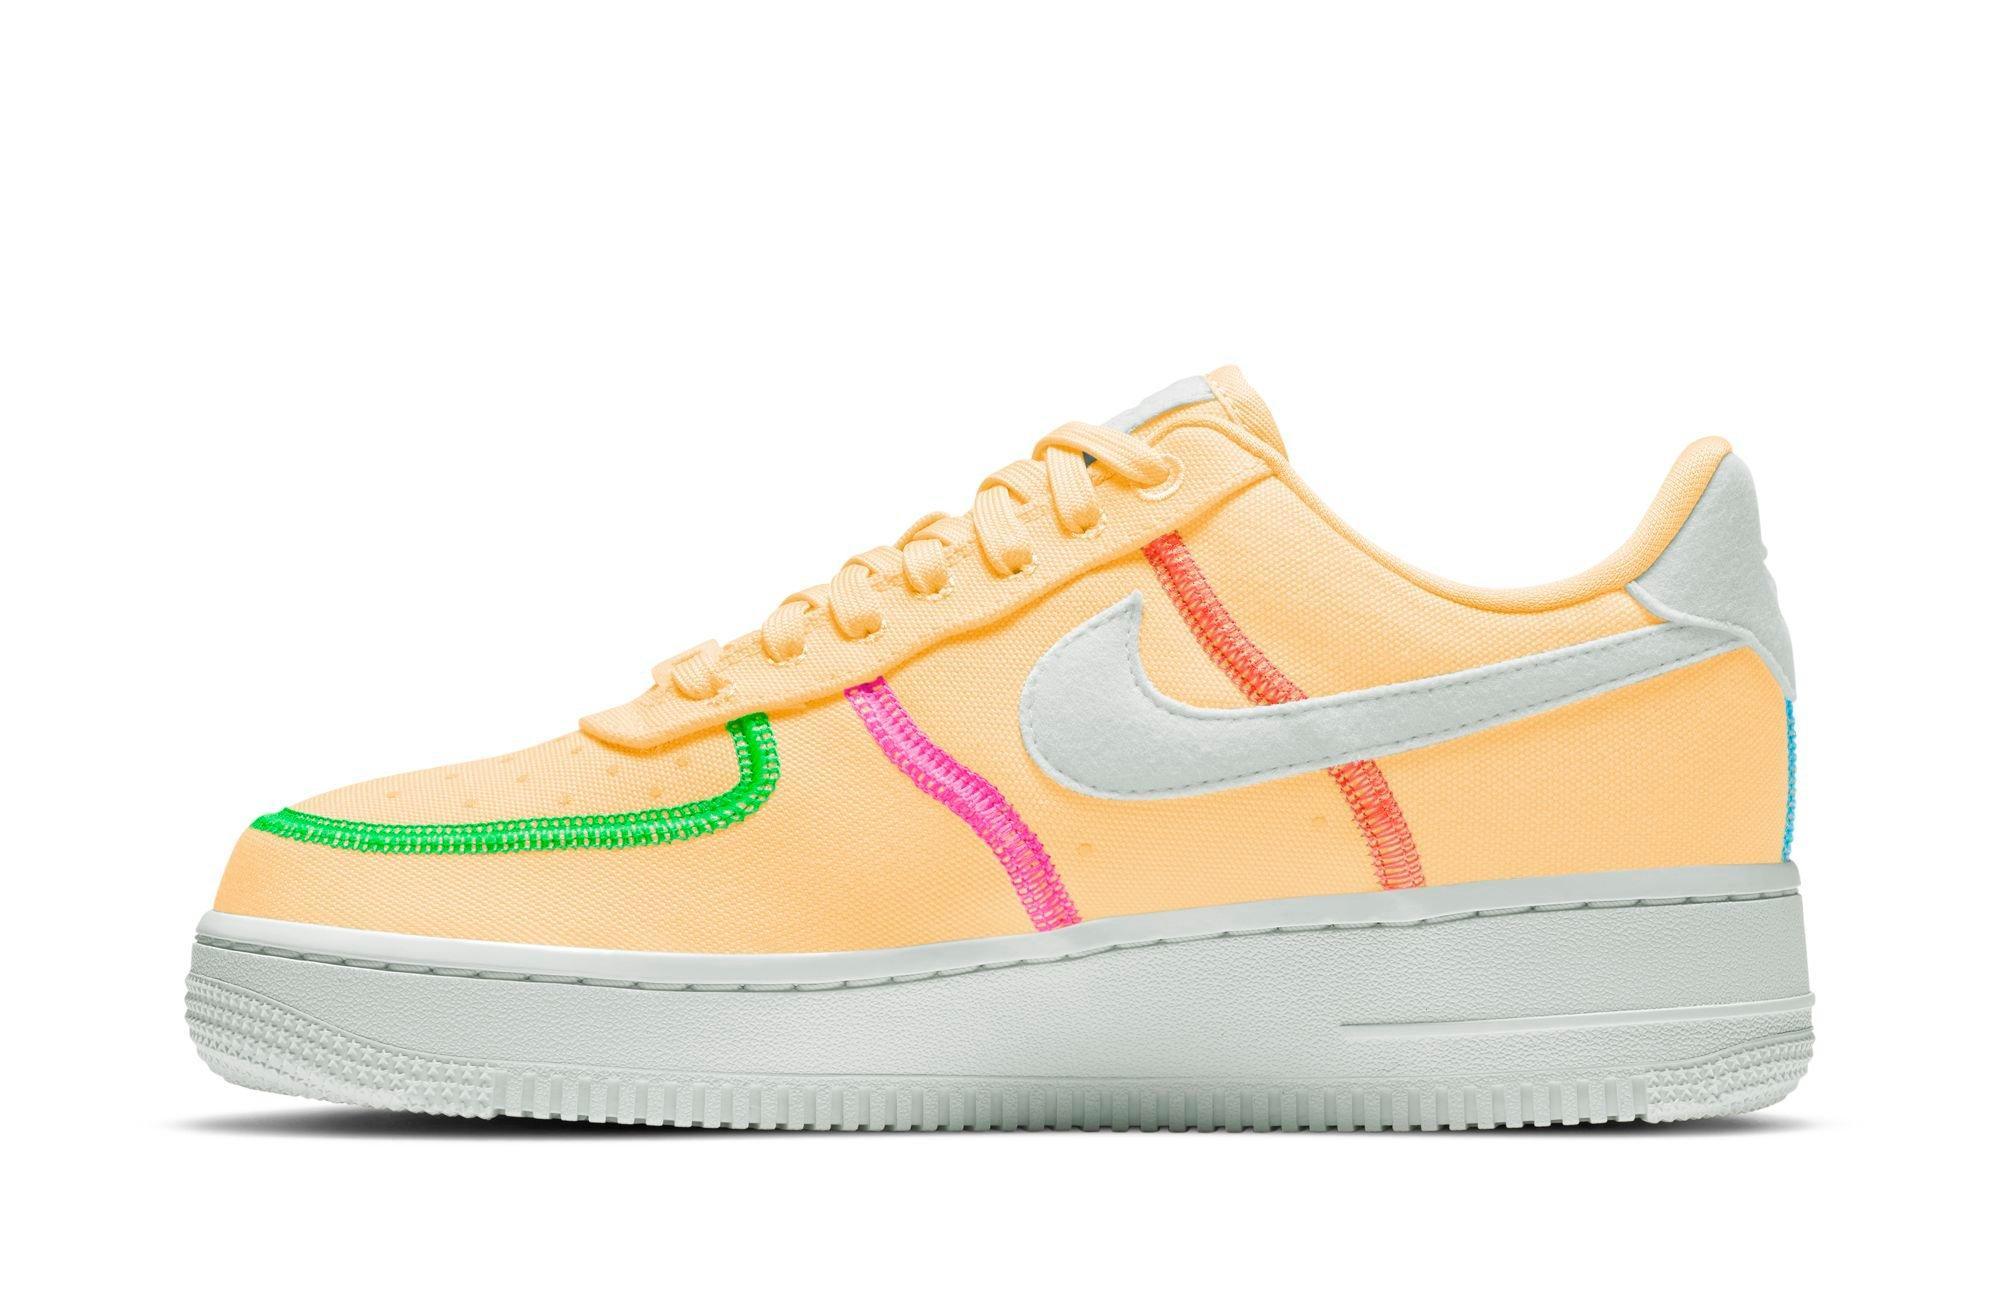 "Nike Air Force 1 '07 LX ""Melon Tint/Photon Dust"" Women's Shoe"